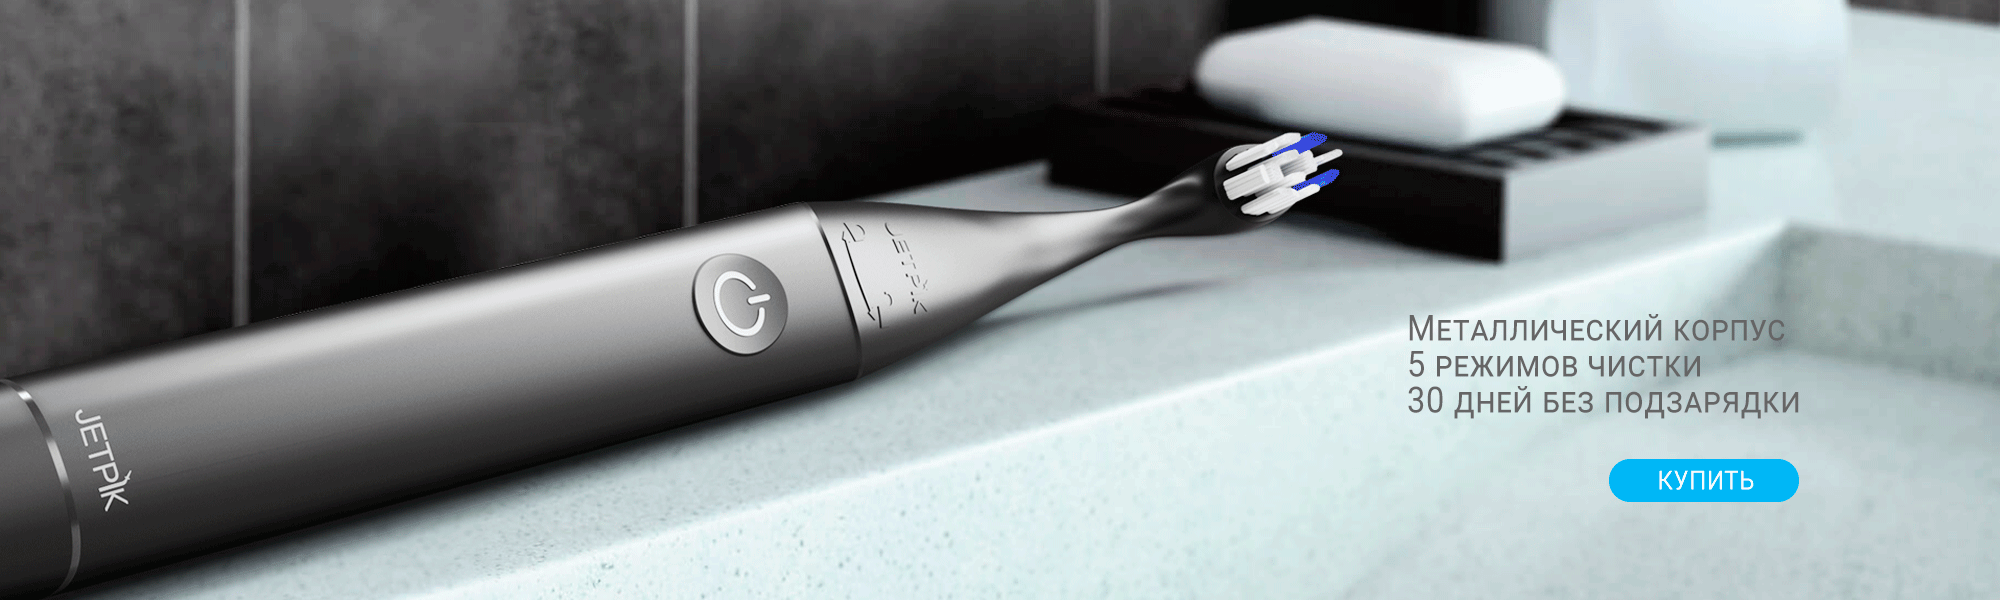 Звуковая зубная щетка Jetpik-JP300